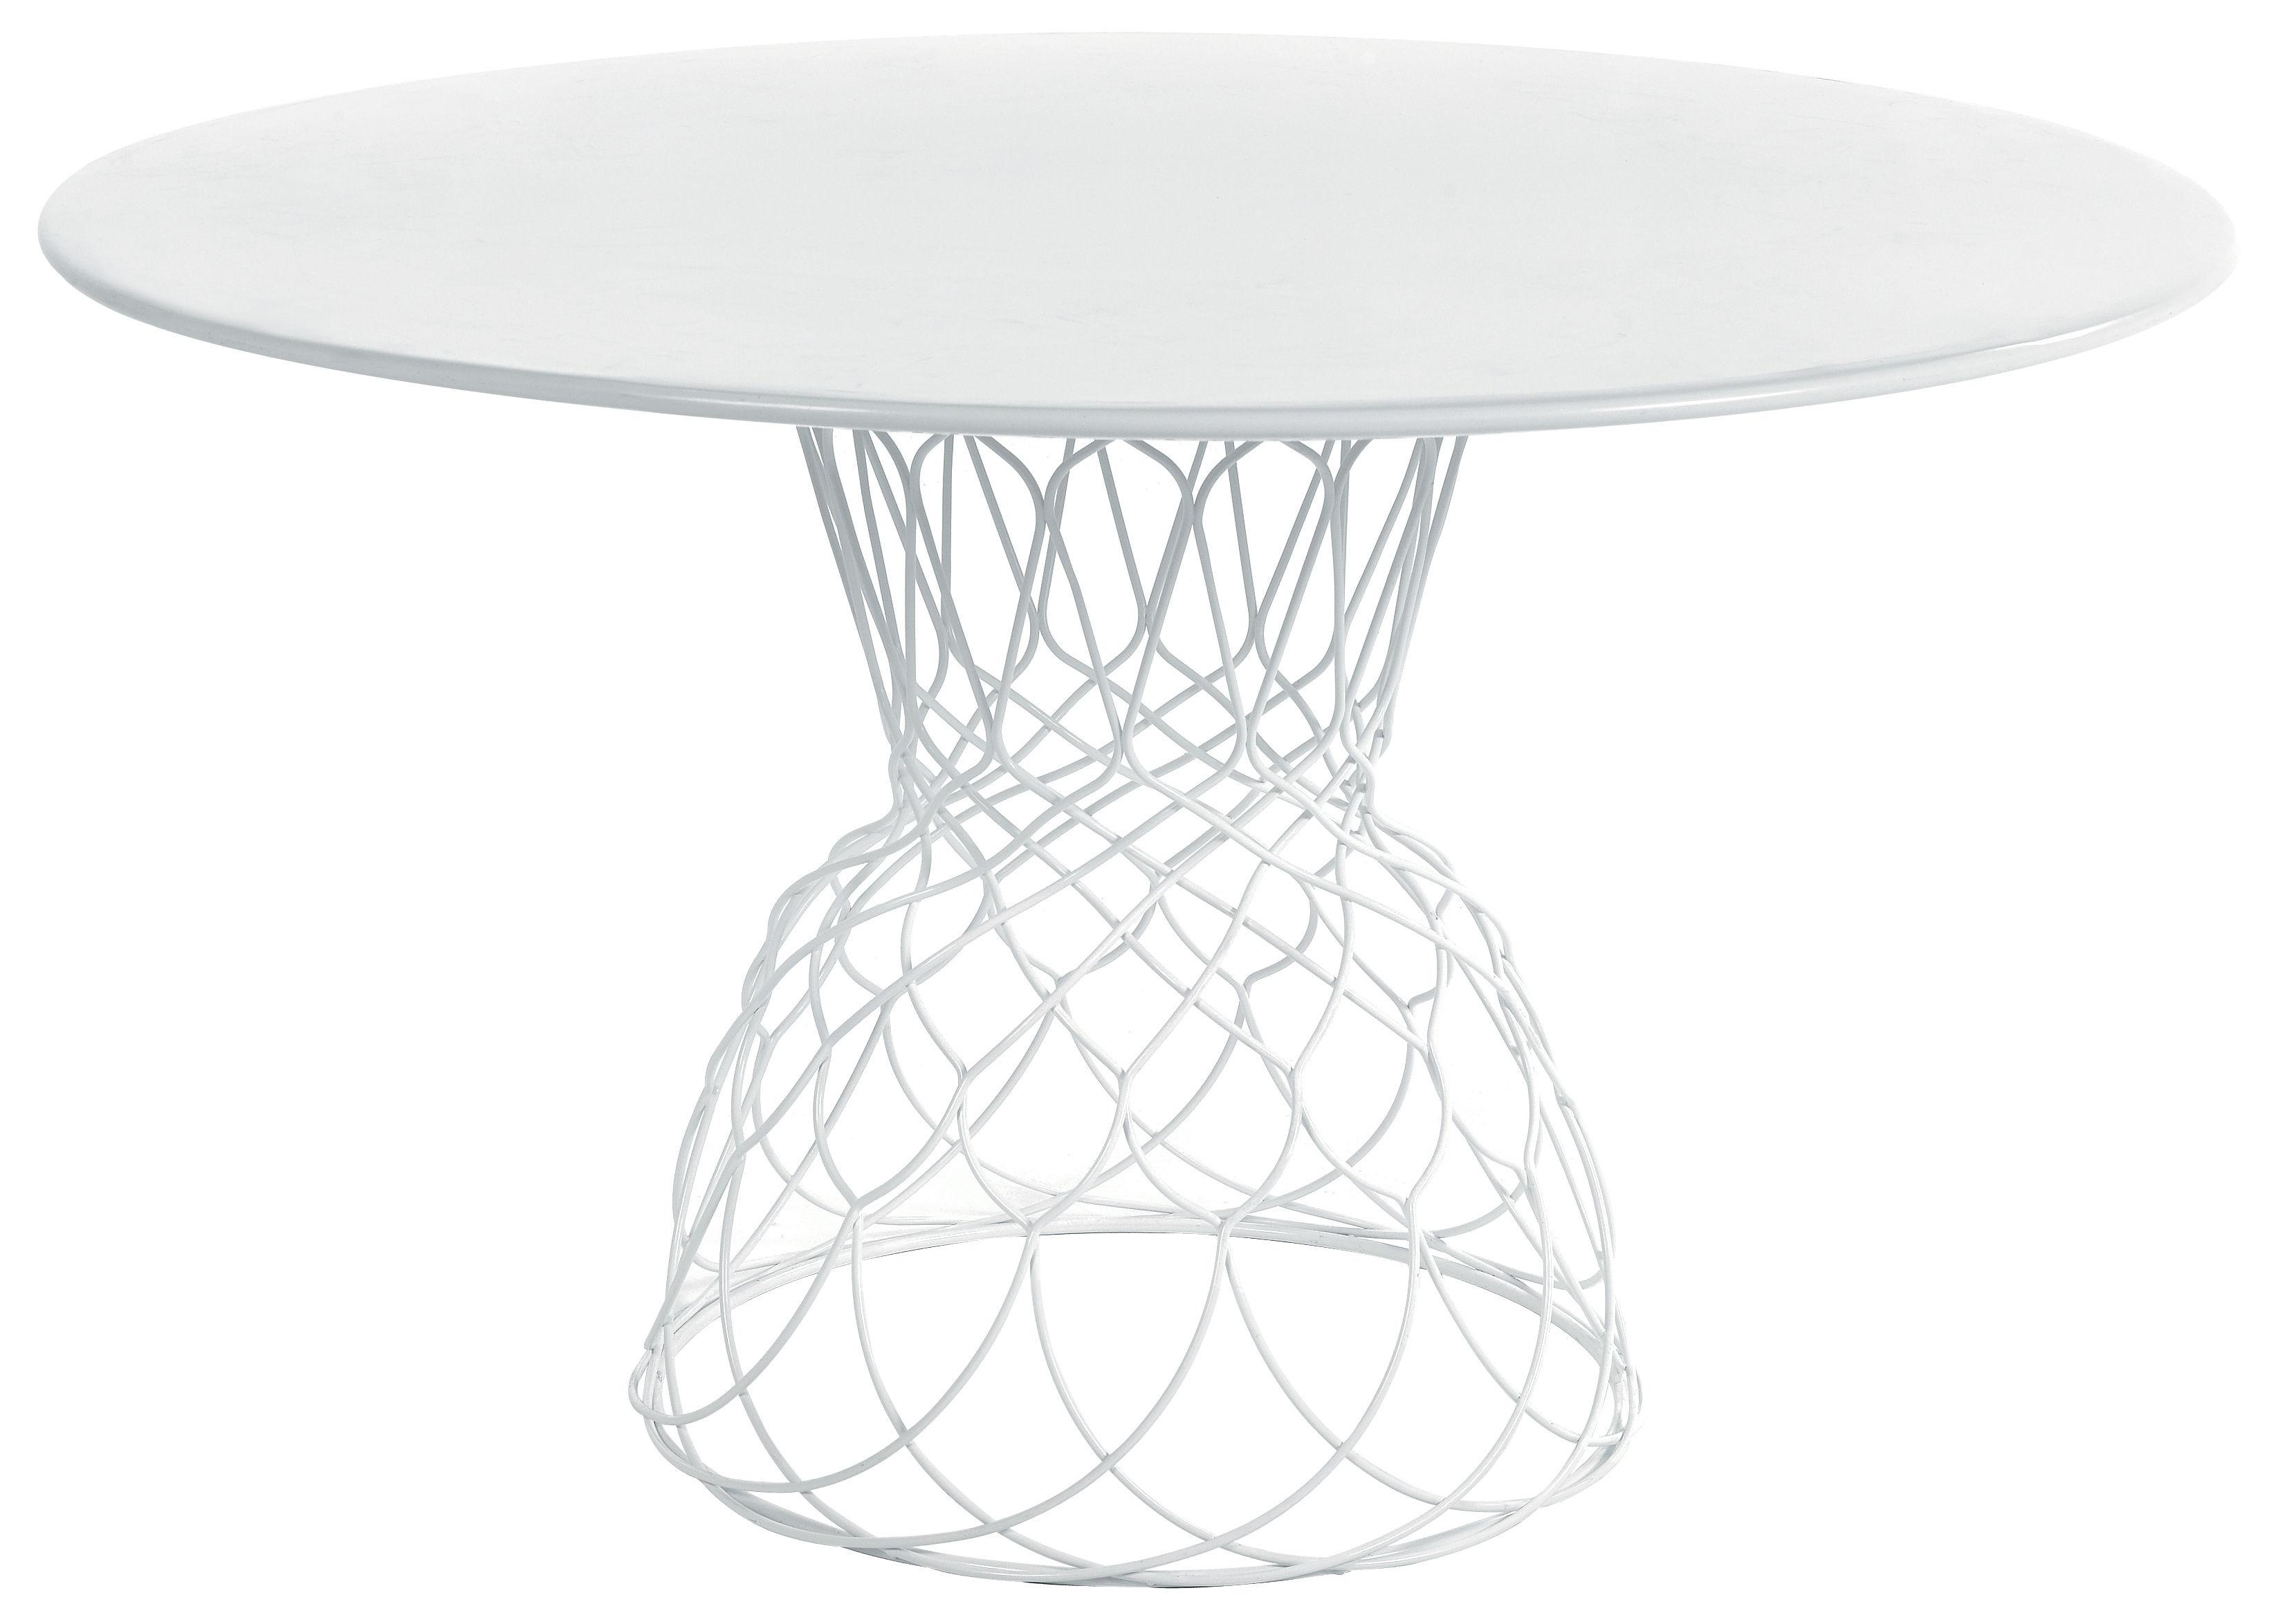 Outdoor - Tavoli  - Tavolo rotondo Re-trouvé - Ø 130 cm di Emu - Bianco - Acciaio